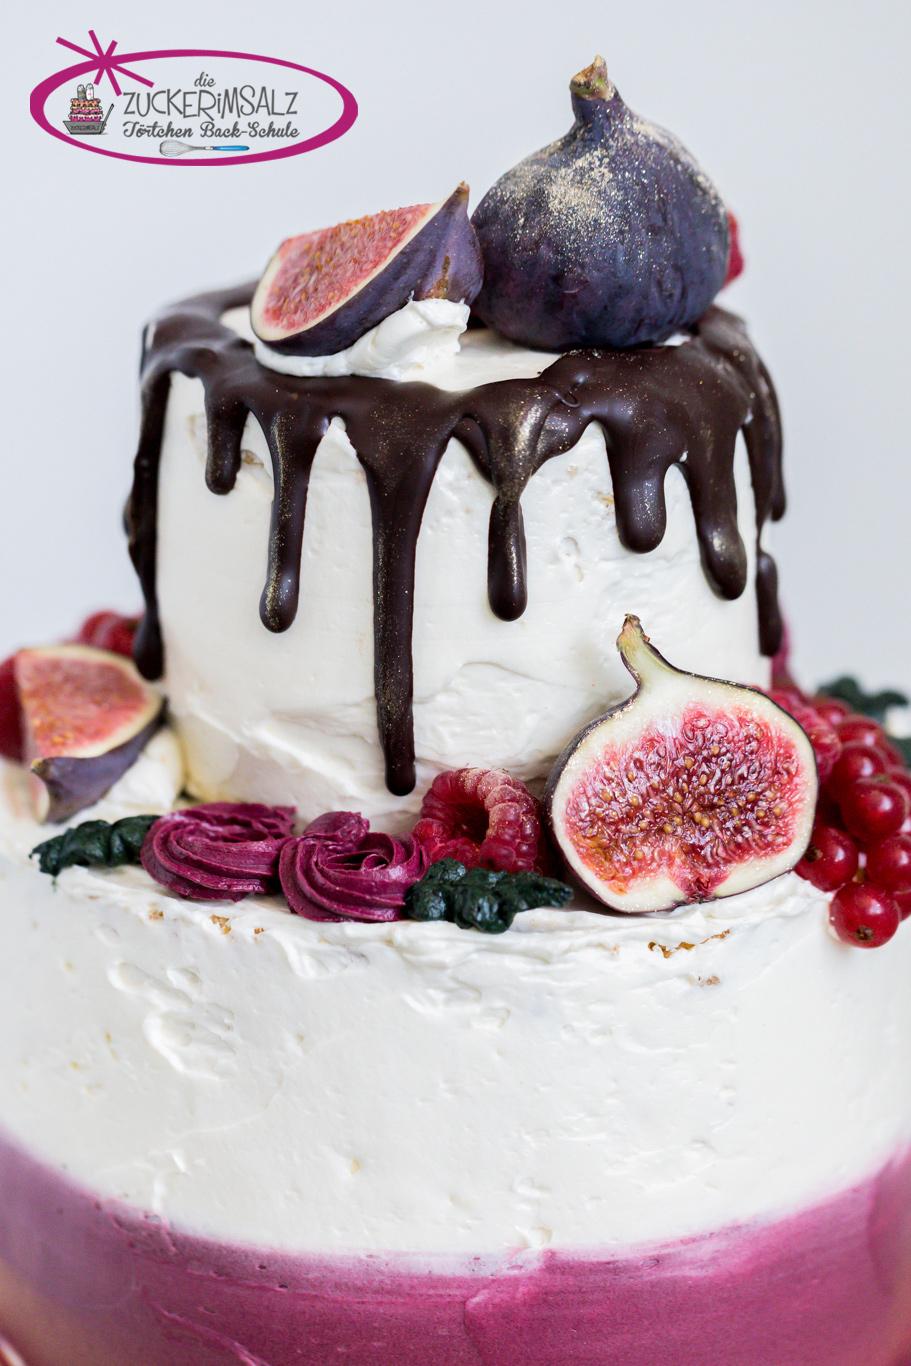 Torte, Törtchen, Backschule, zweistöckig, Mini Torte, Dekorieren